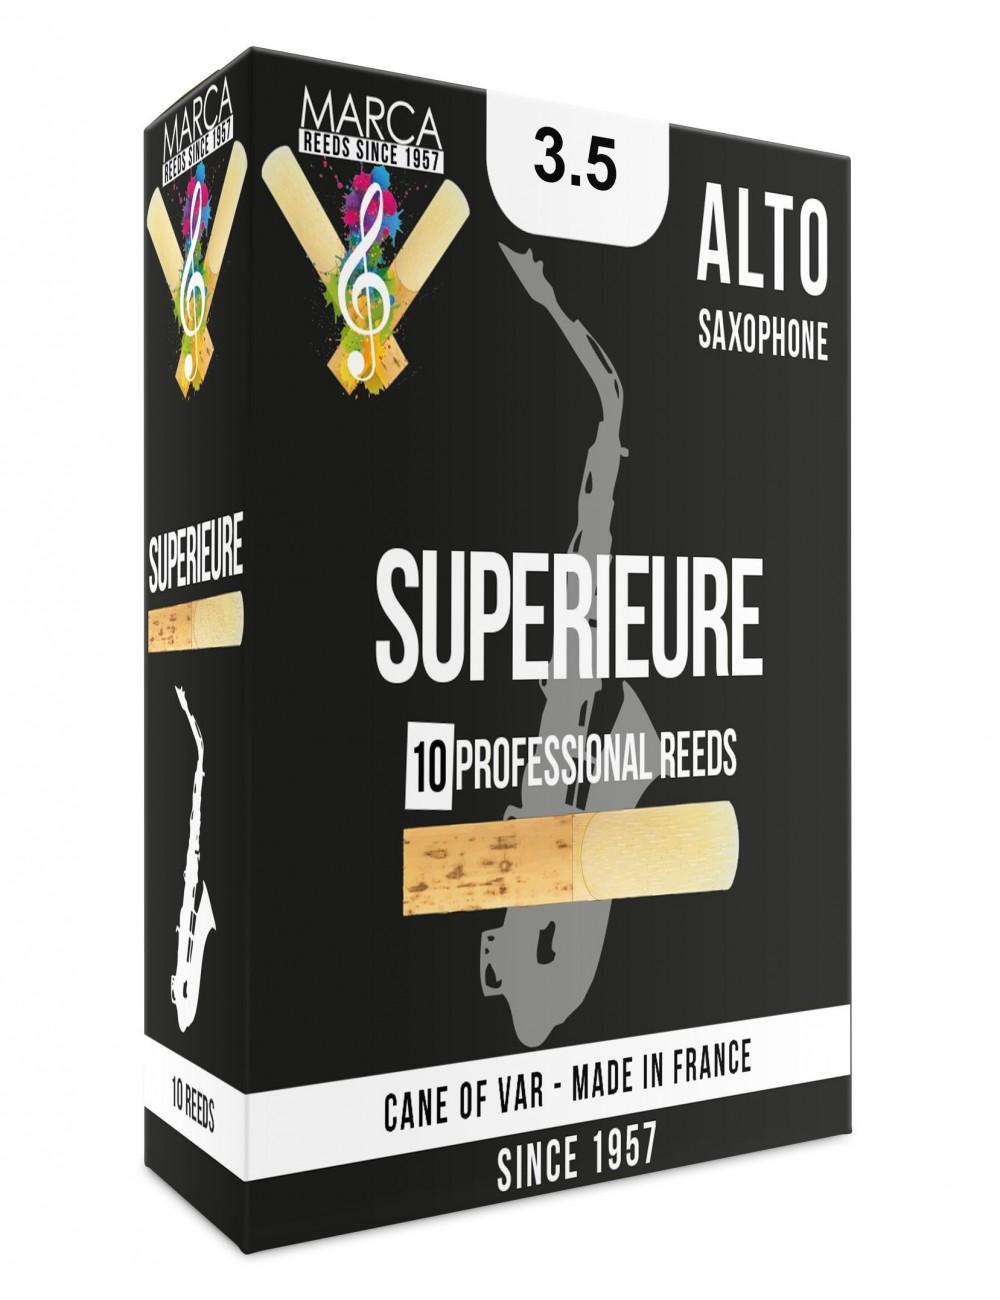 10 ANCHES MARCA SUPERIEURE SAXOPHONE ALTO 3.5